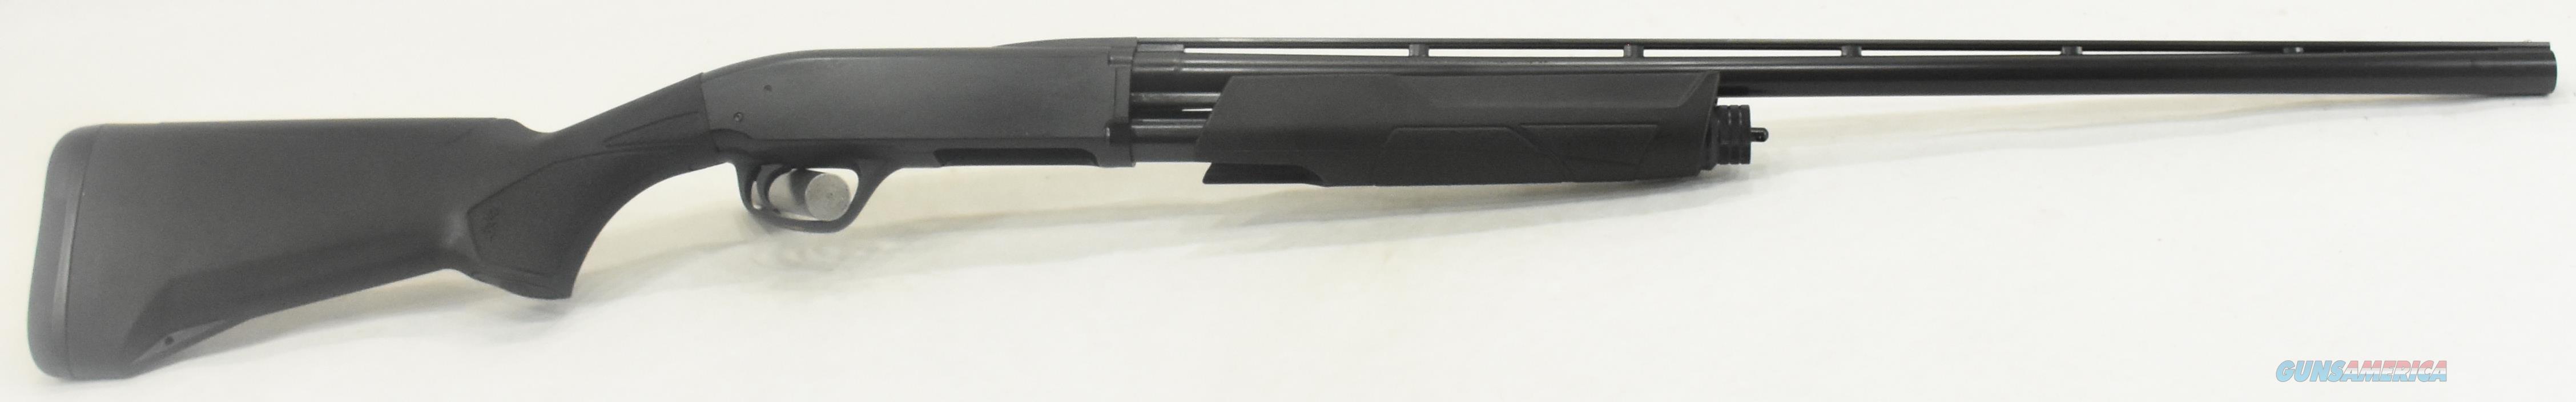 BPS Field Composite 20Ga 26-3In  012289605  Guns > Shotguns > Browning Shotguns > Pump Action > Hunting